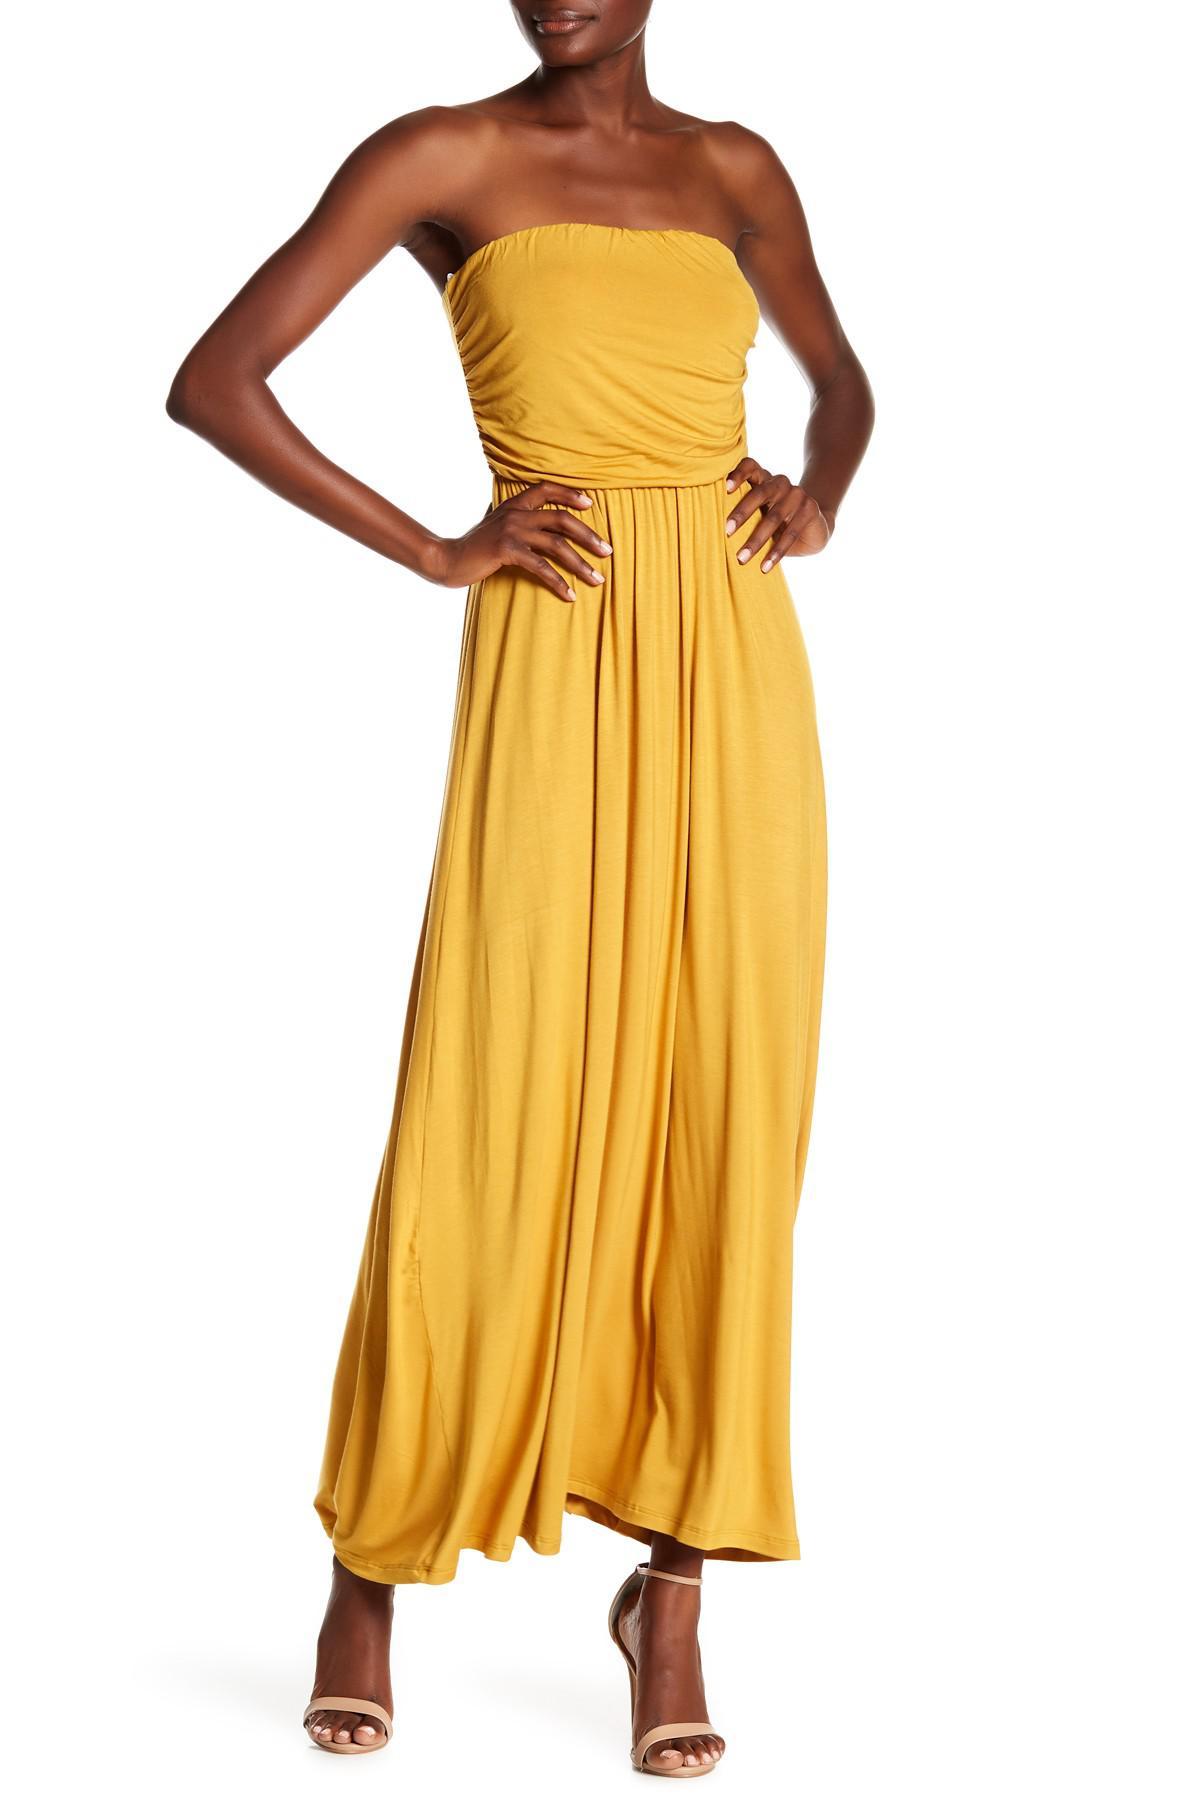 60142f8bb63 Lyst - West Kei Strapless Maxi Dress in Yellow